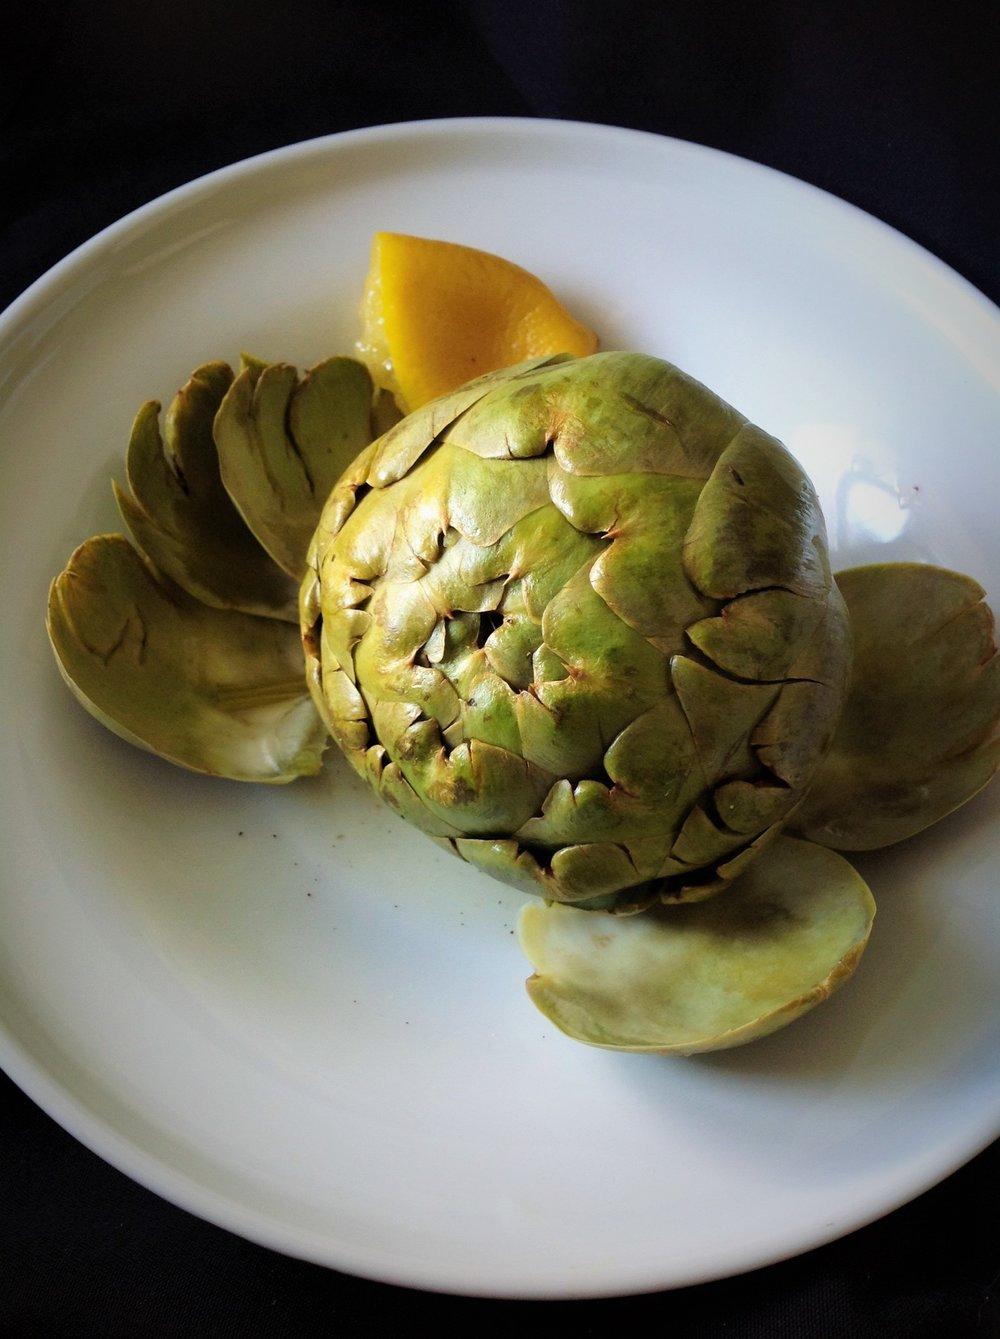 Microwave-Steamed Artichoke with Lemon Steamed